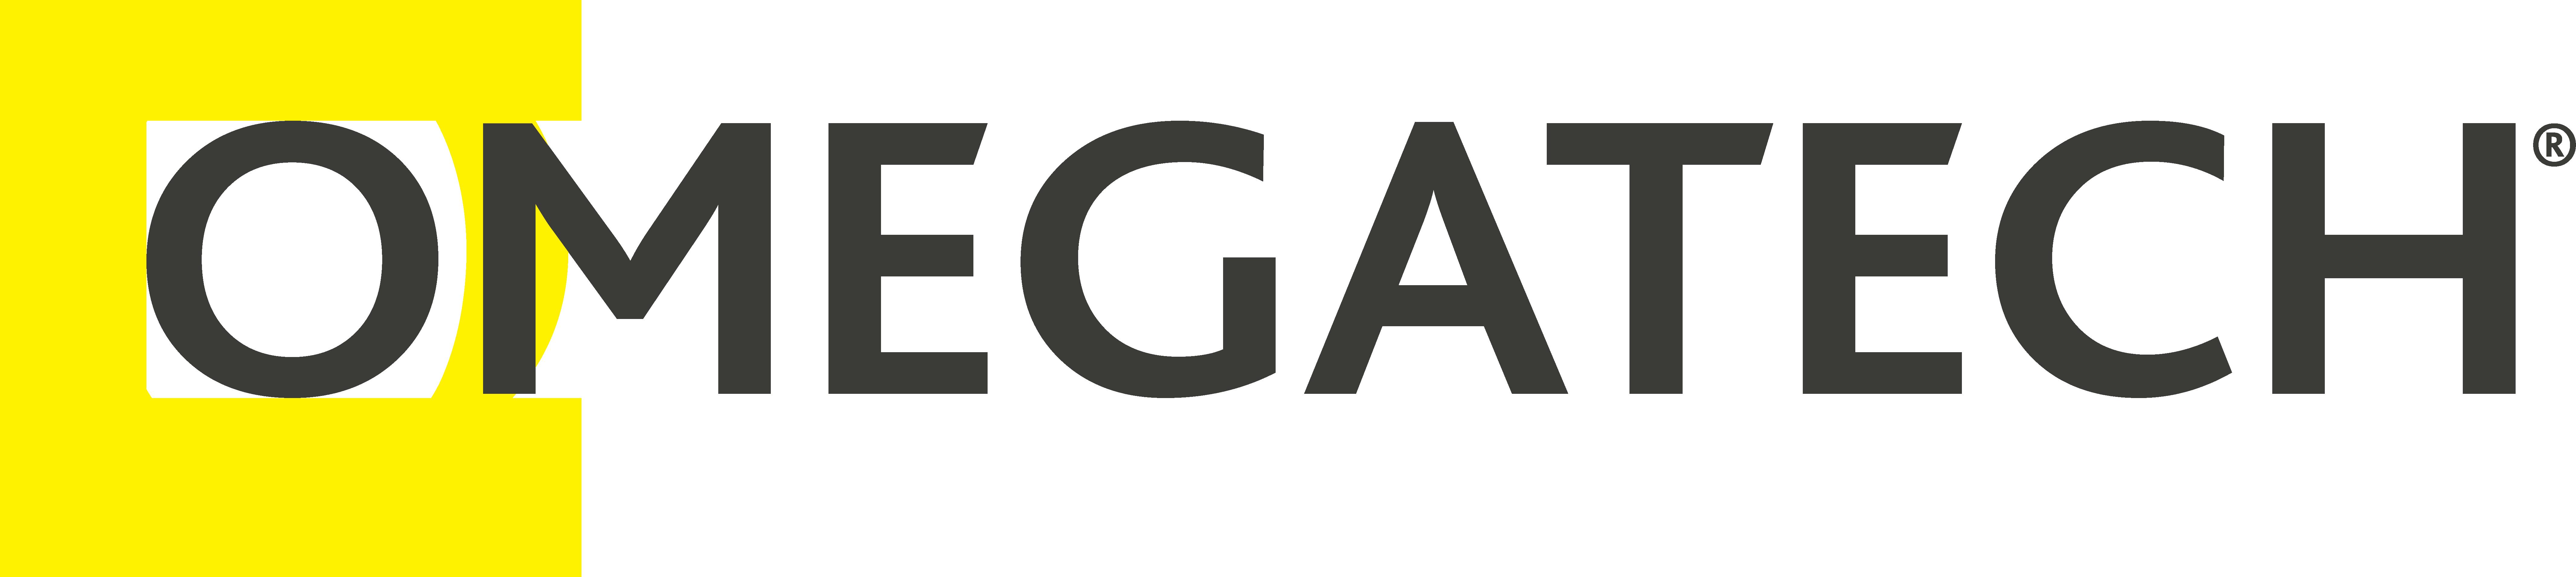 Omegatech Logo HD